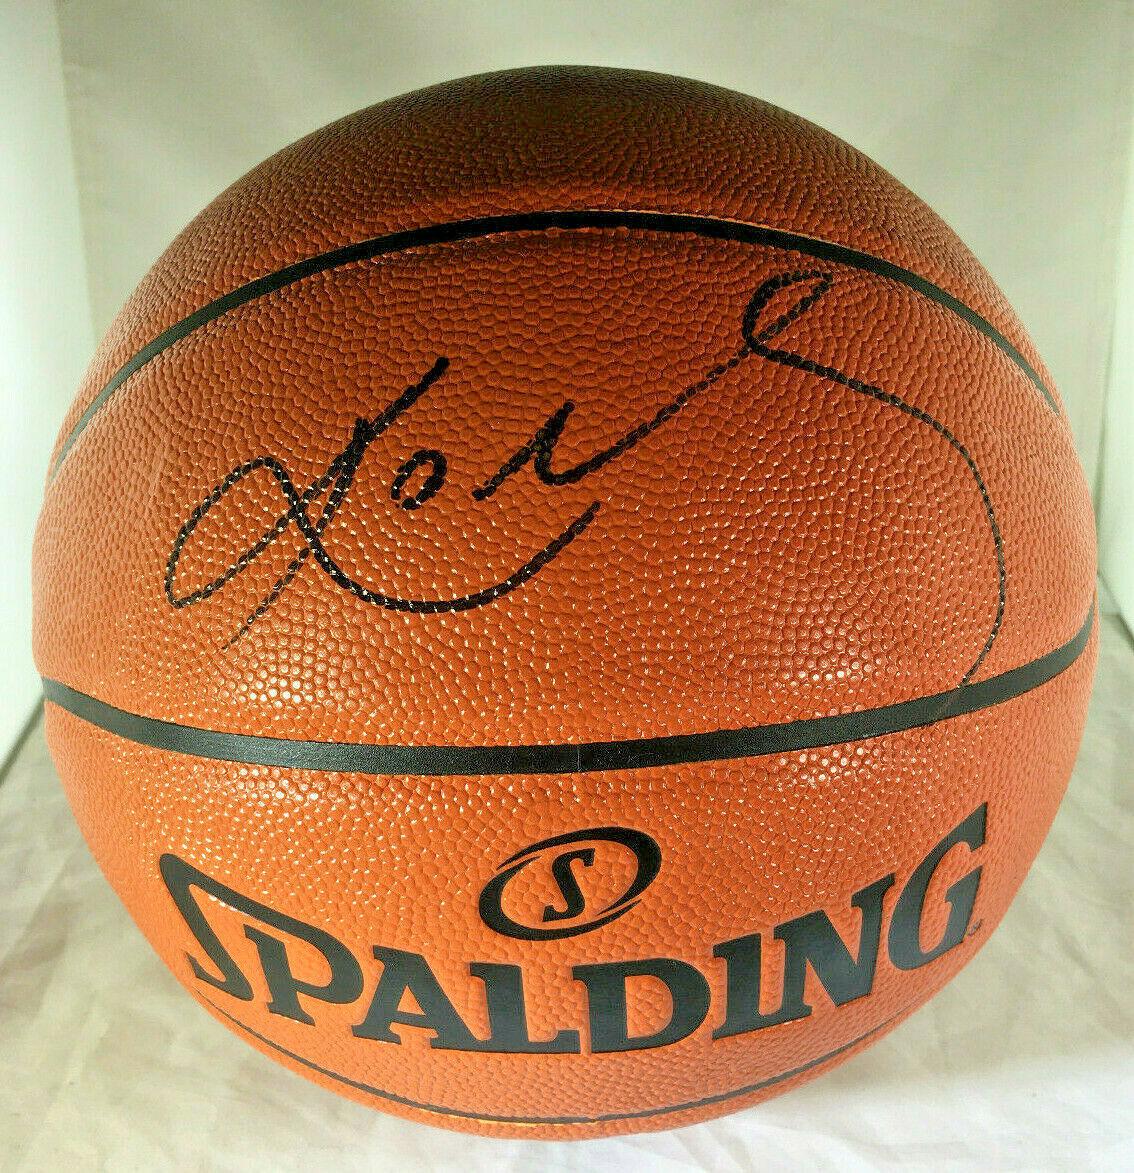 KOBE BRYANT / NBA HALL OF FAME / AUTOGRAPHED FULL SIZE NBA LOGO BASKETBALL / COA